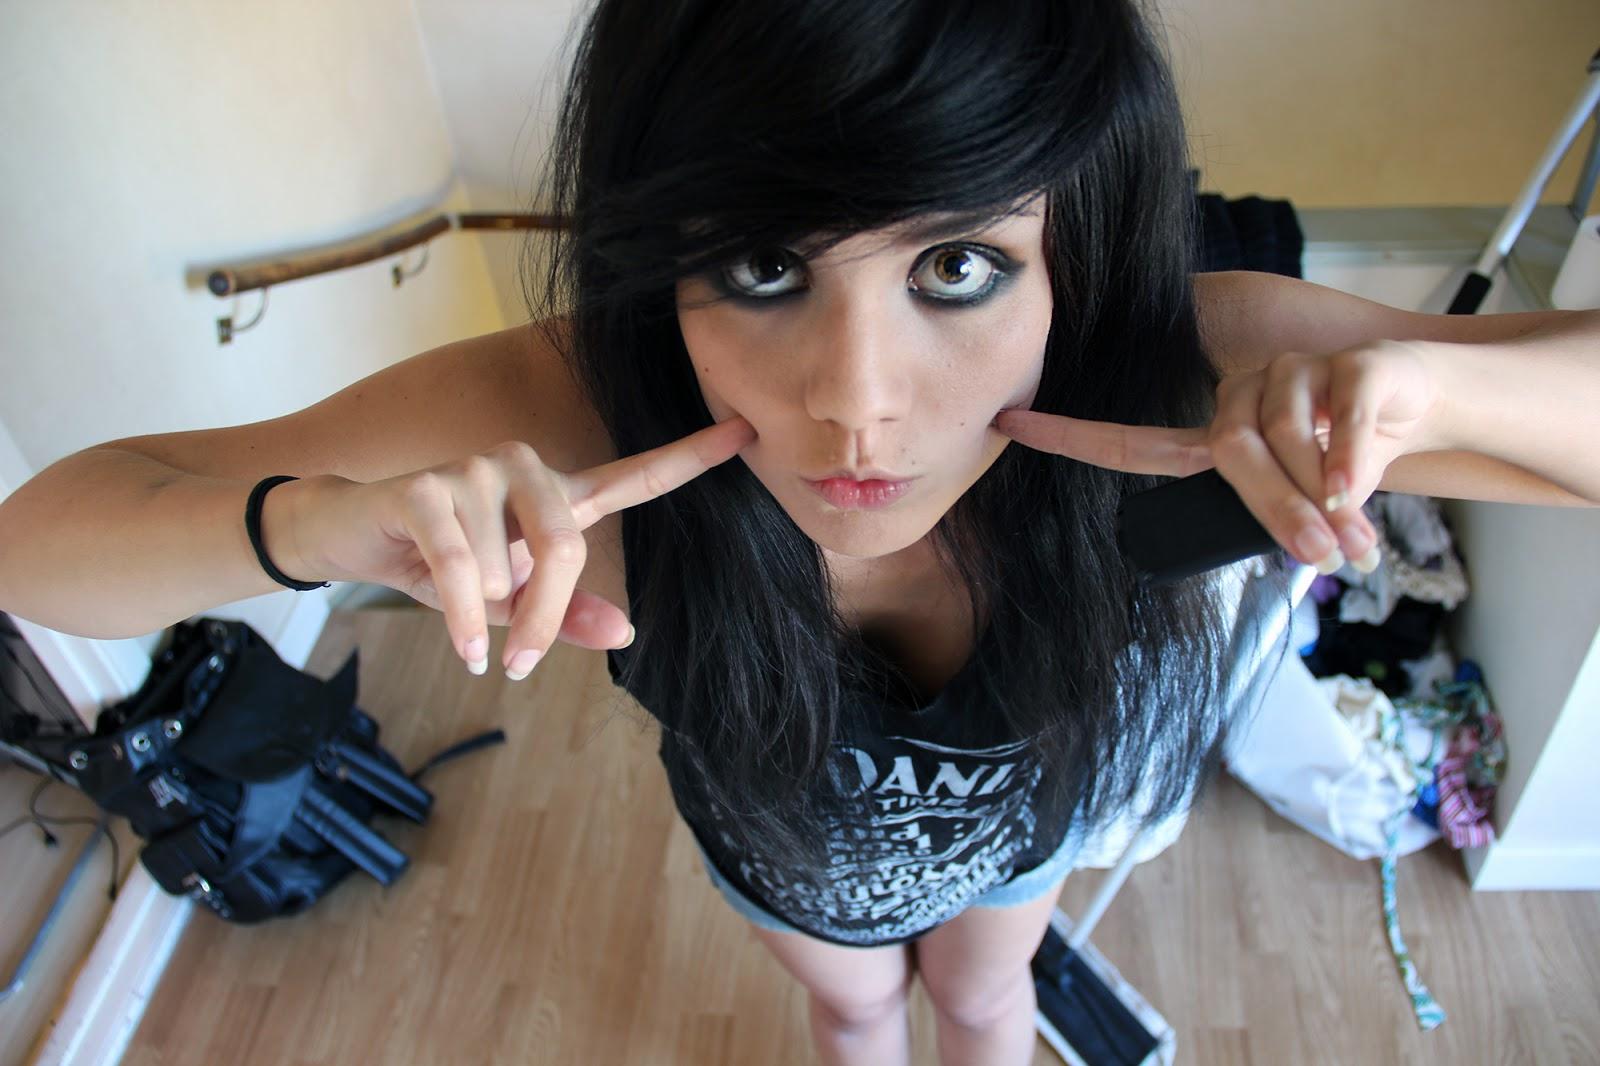 rocker girl emo scene jack daniels top